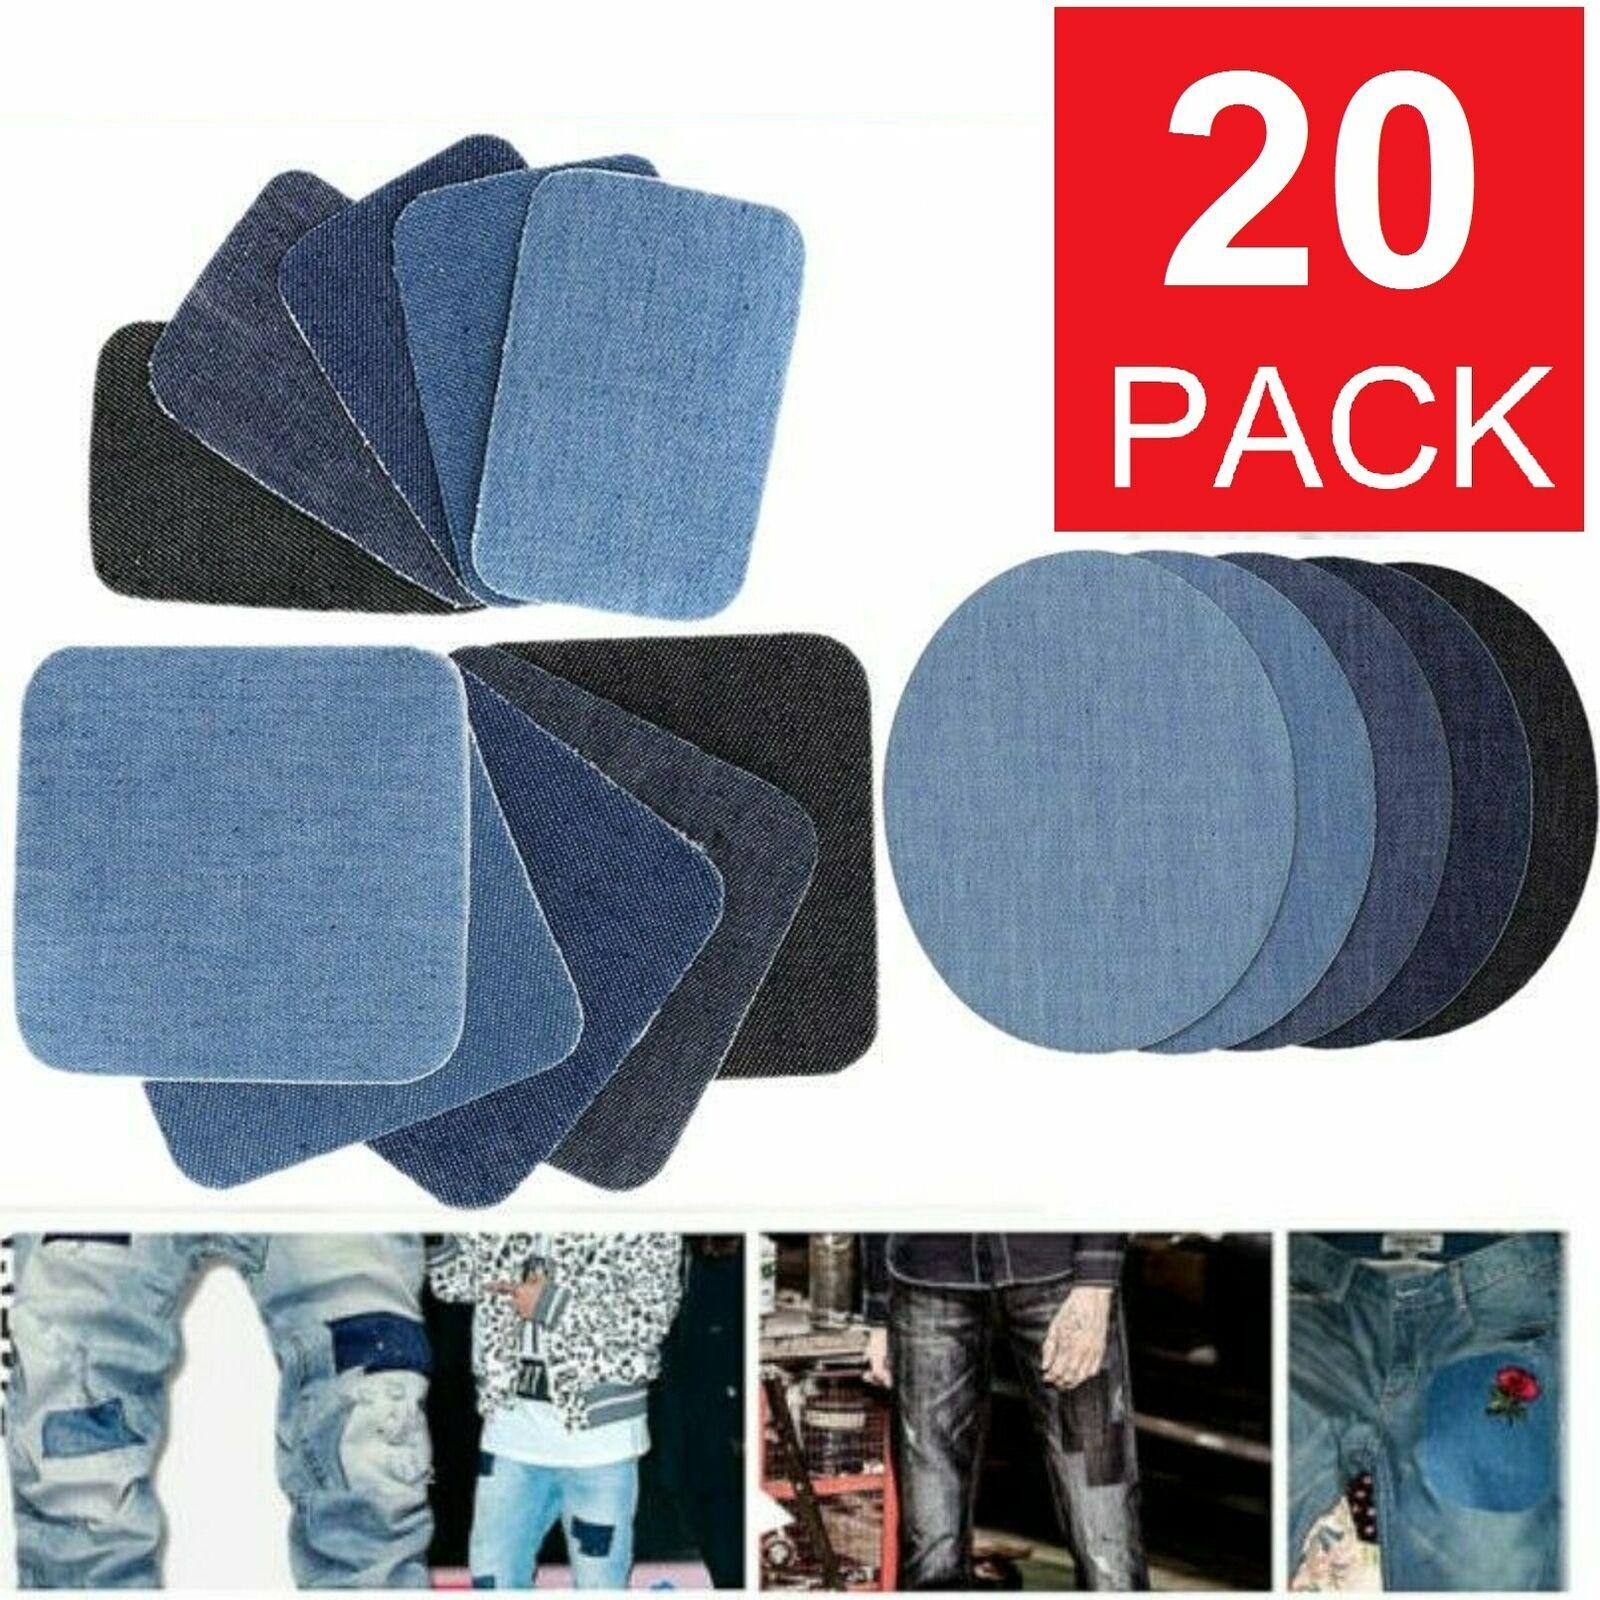 20PCS DIY Design Iron on Denim Fabric Patches Clothing Jeans Repair Kit 4 Colors